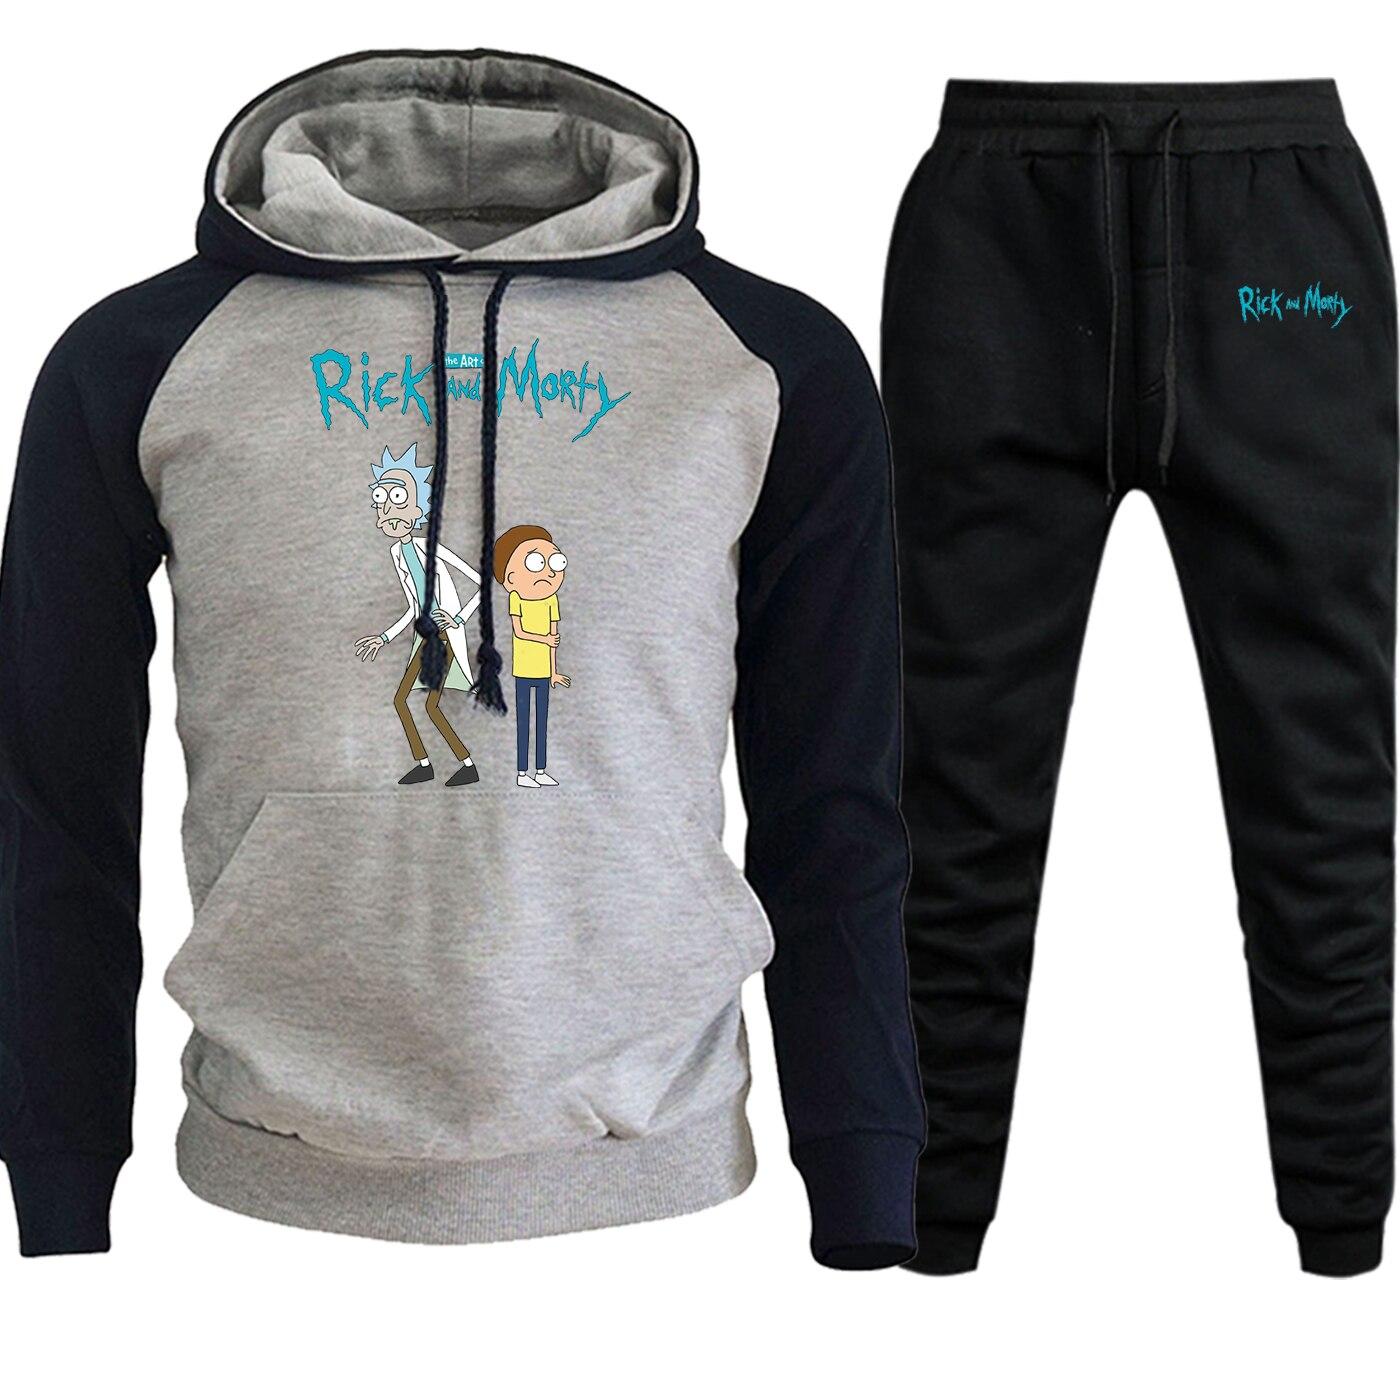 Rick And Thick Sweatshirts New 2019 Autumn Winter Hooded Raglan+Pants Sets Mens Cartoon Print Hoodies Hip Hop Suit Male Pullover